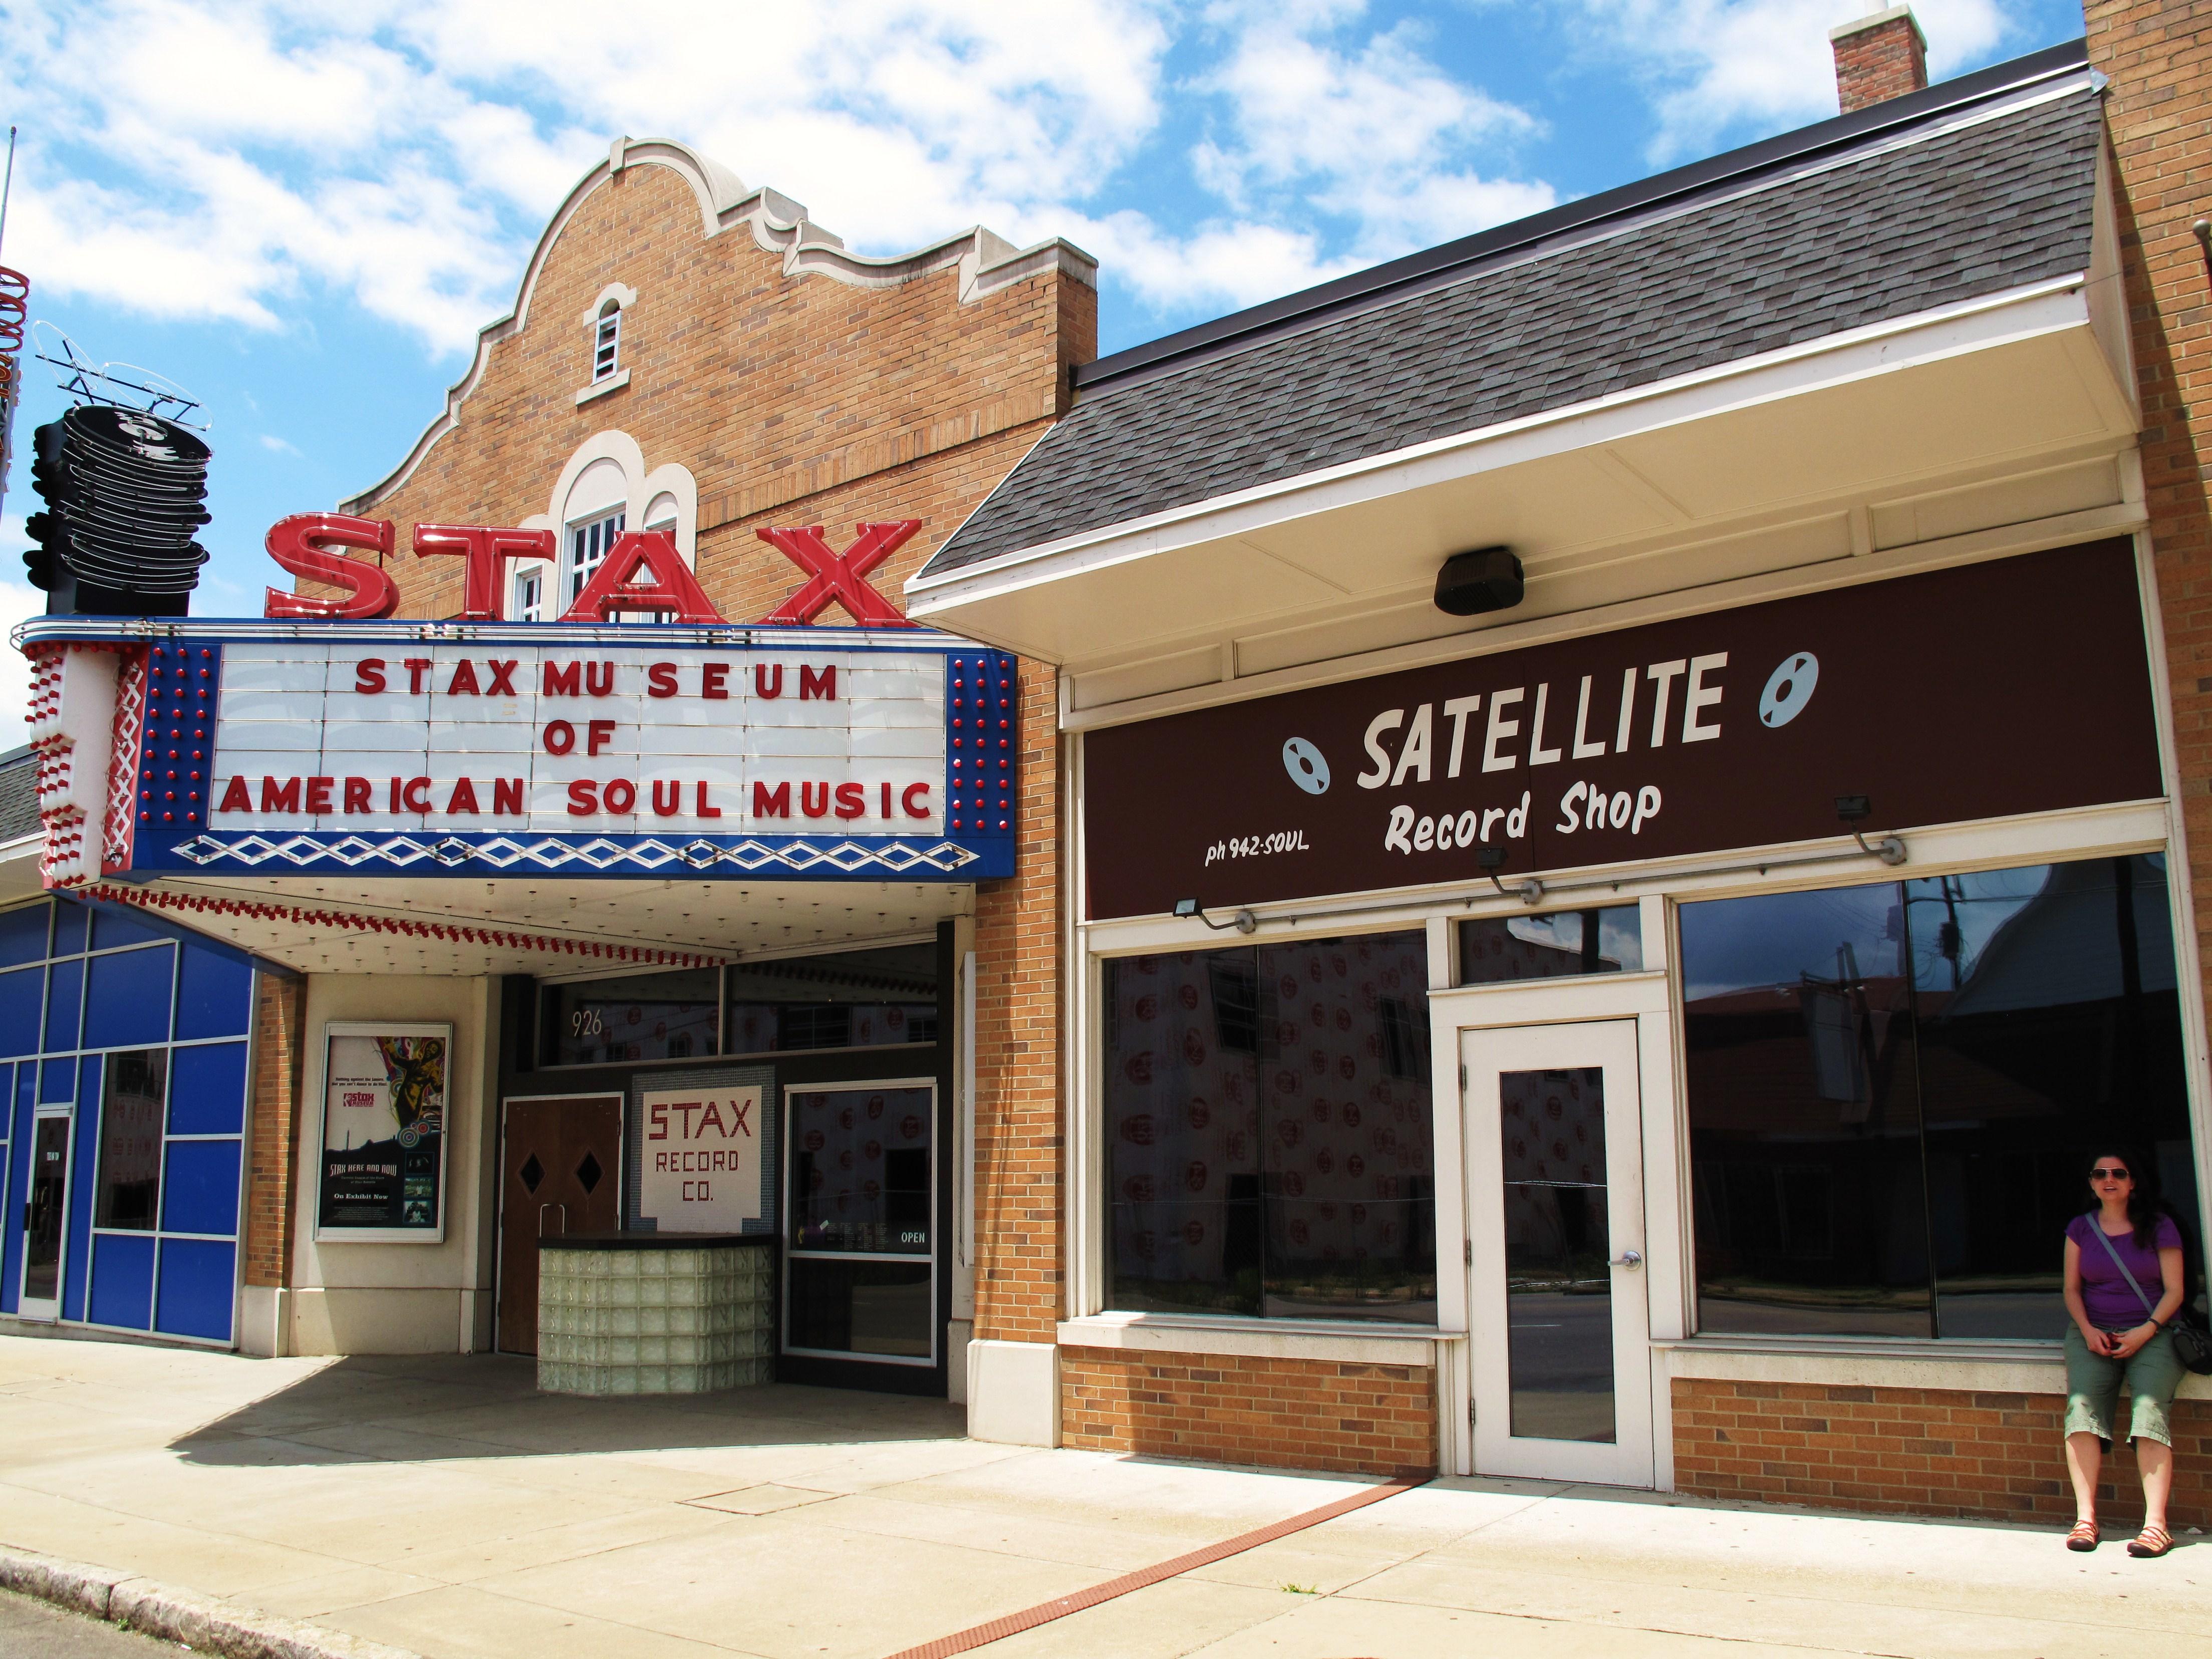 Stax Museum & Satellite Record Shop.jpg